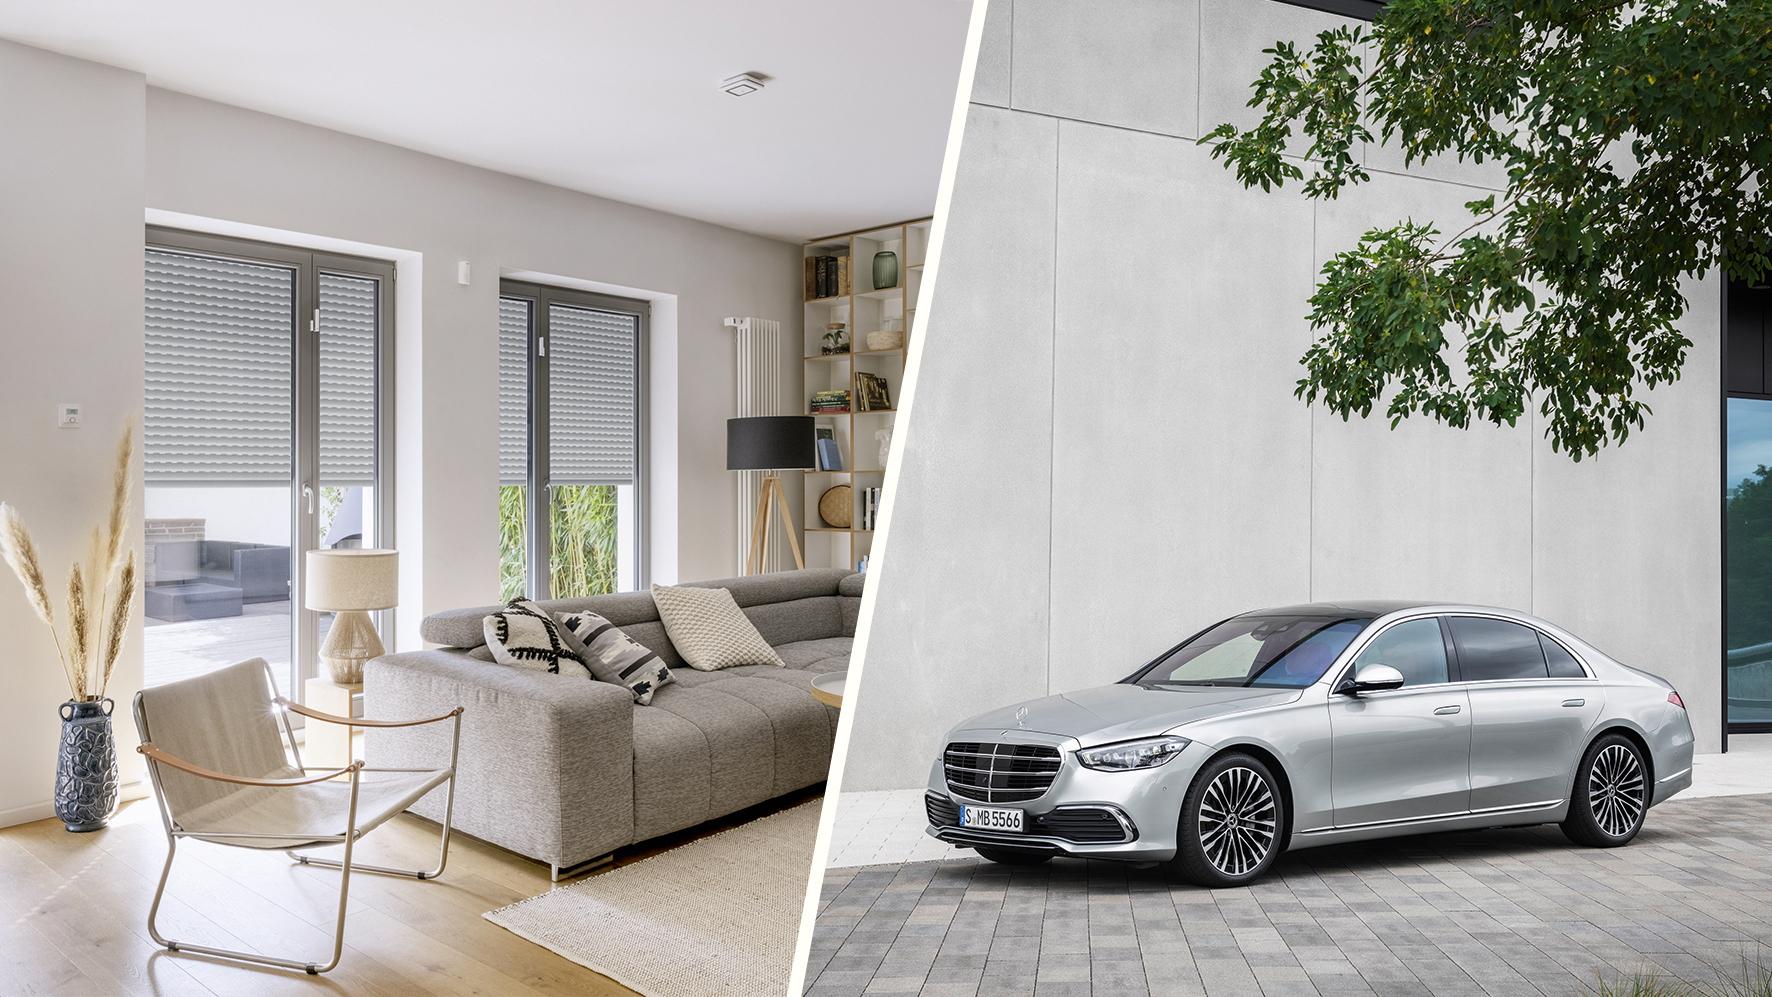 Bosch Smart Home Partner Program dà il benvenuto a Mercedes-Benz Classe S